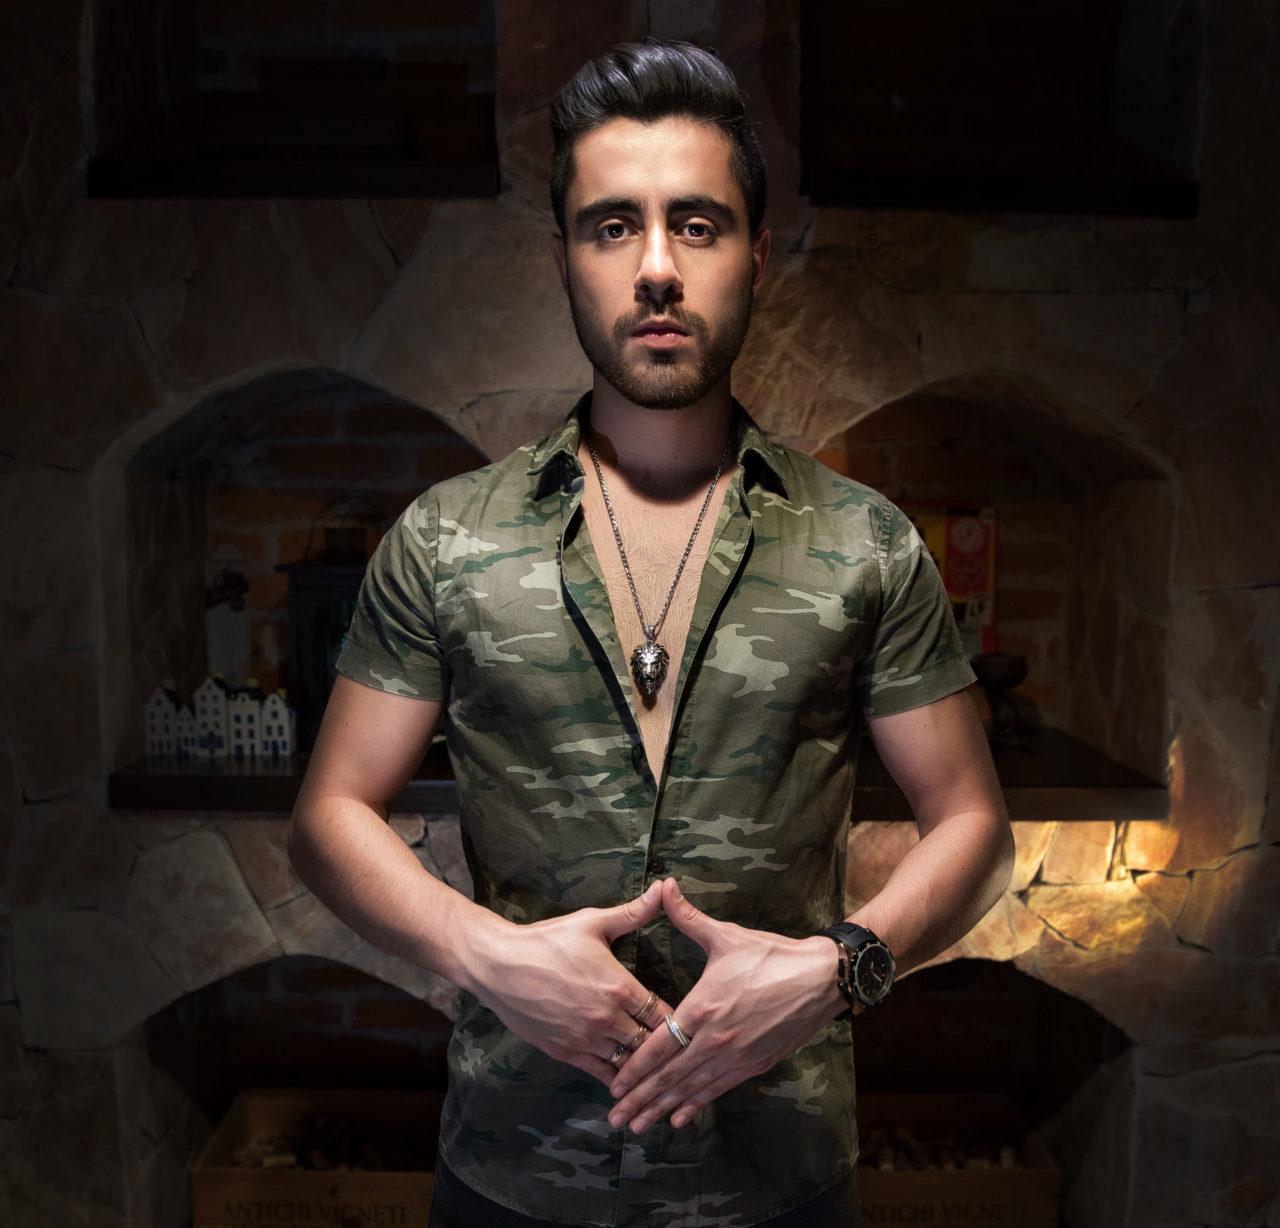 Foto-12-Sebastian-Castro-Musica-Musica-Sebastian_Castro-Pop-Urbana-Mexico-2020-Influencer-Artista-Cantante-Singer